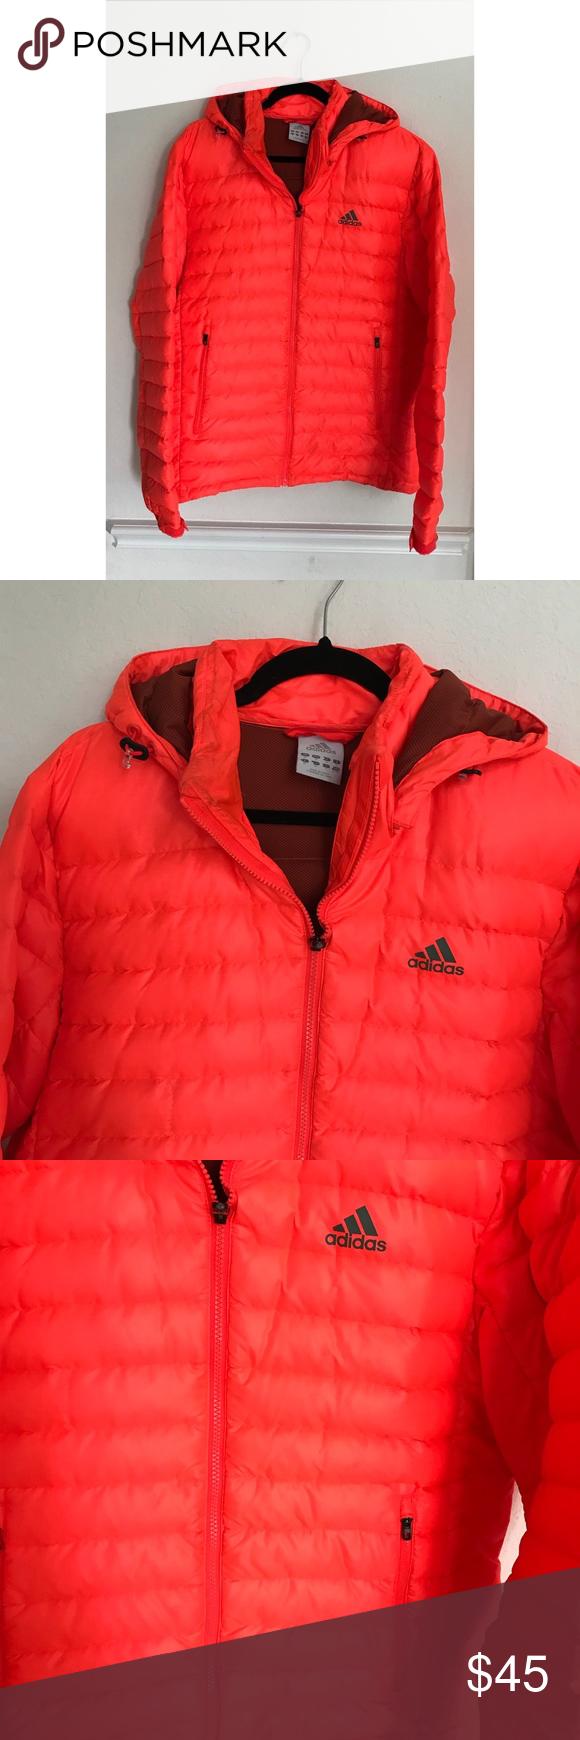 Adidas Neon Orange Puffer Jacket Orange Puffer Jacket Jackets Puffer Jackets [ 1740 x 580 Pixel ]